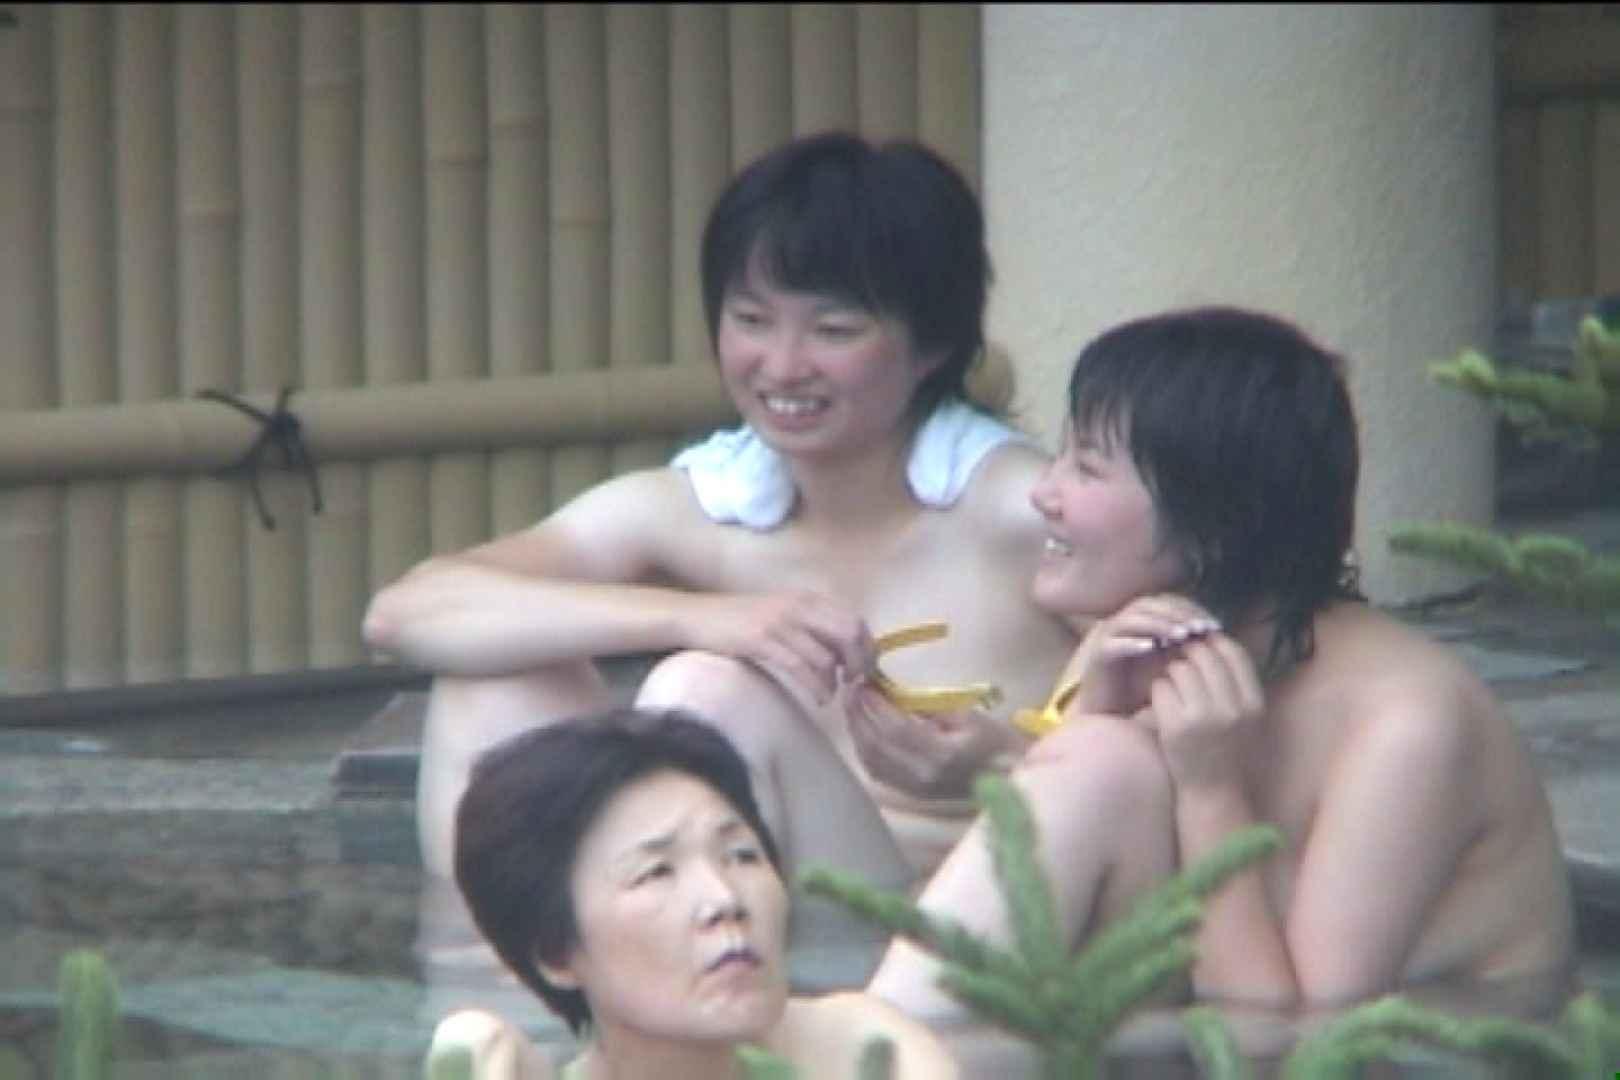 Aquaな露天風呂Vol.99【VIP限定】 OL女体  59連発 30